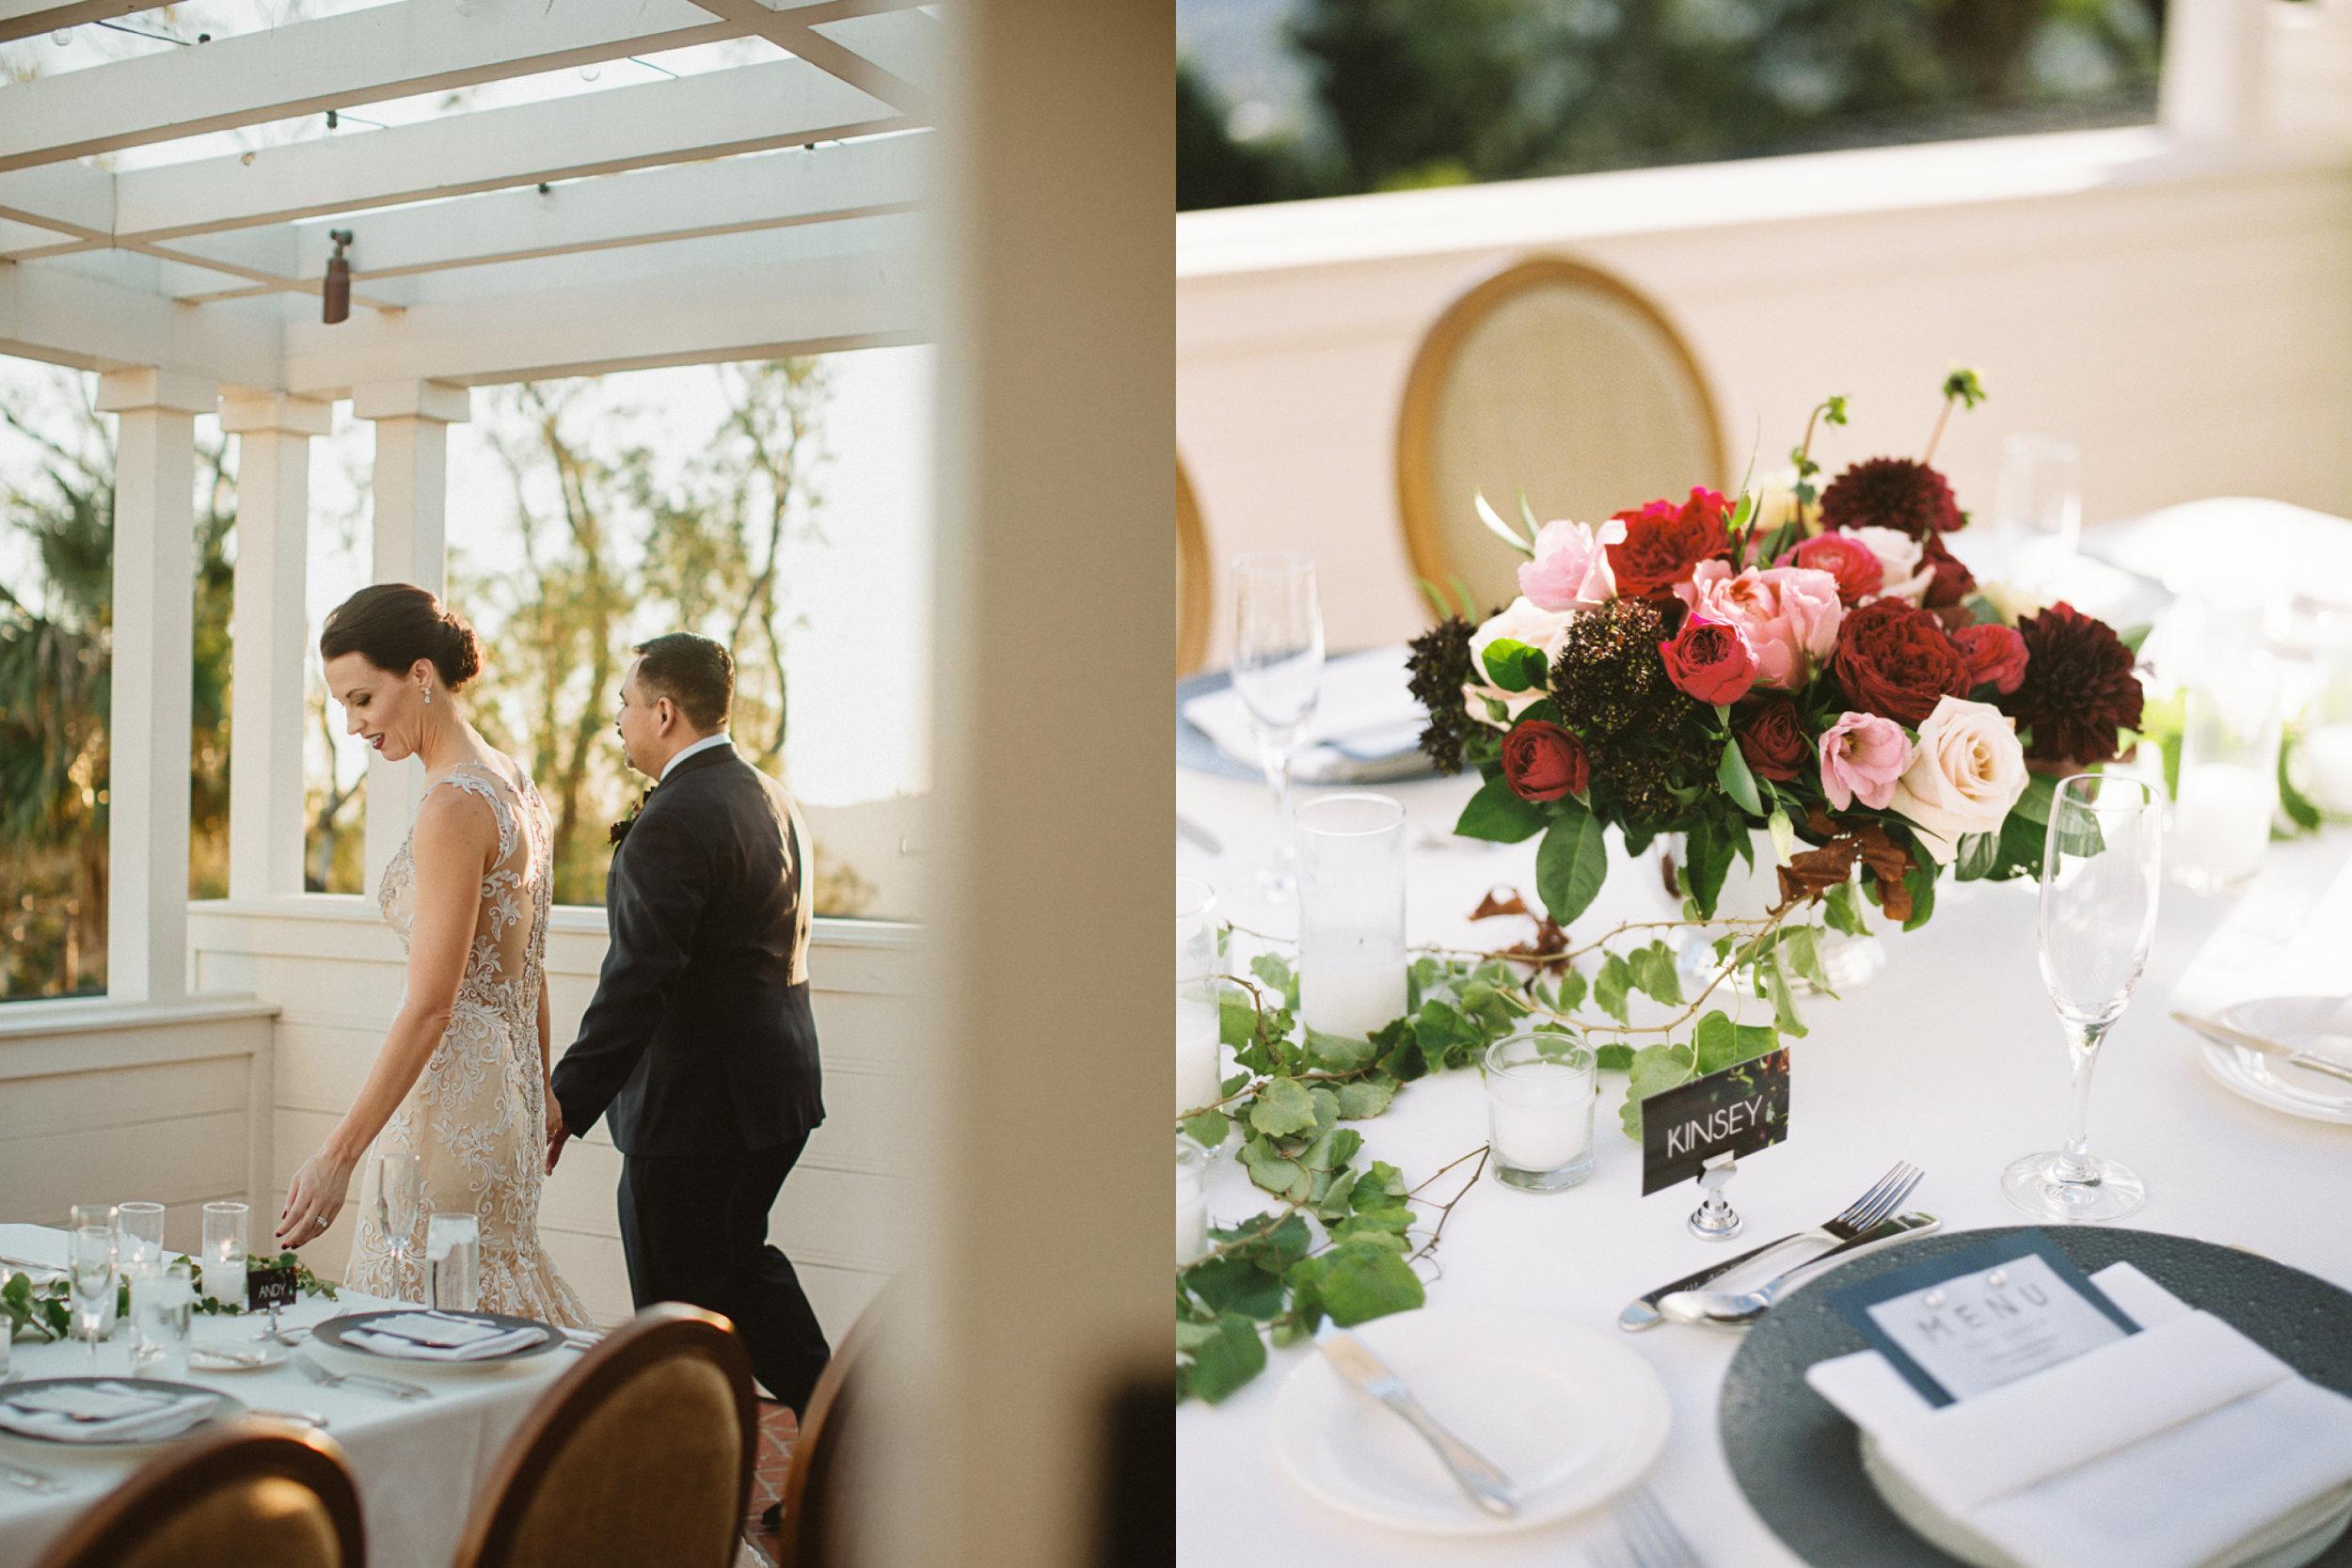 santa-barbara-elopement-elope-alegria-design-event-planner-coordinator-day-of-el-encanto-resort-lily-pond-wedding-intimate-red-maroon-city-ocean-view-rooftop (25).jpg